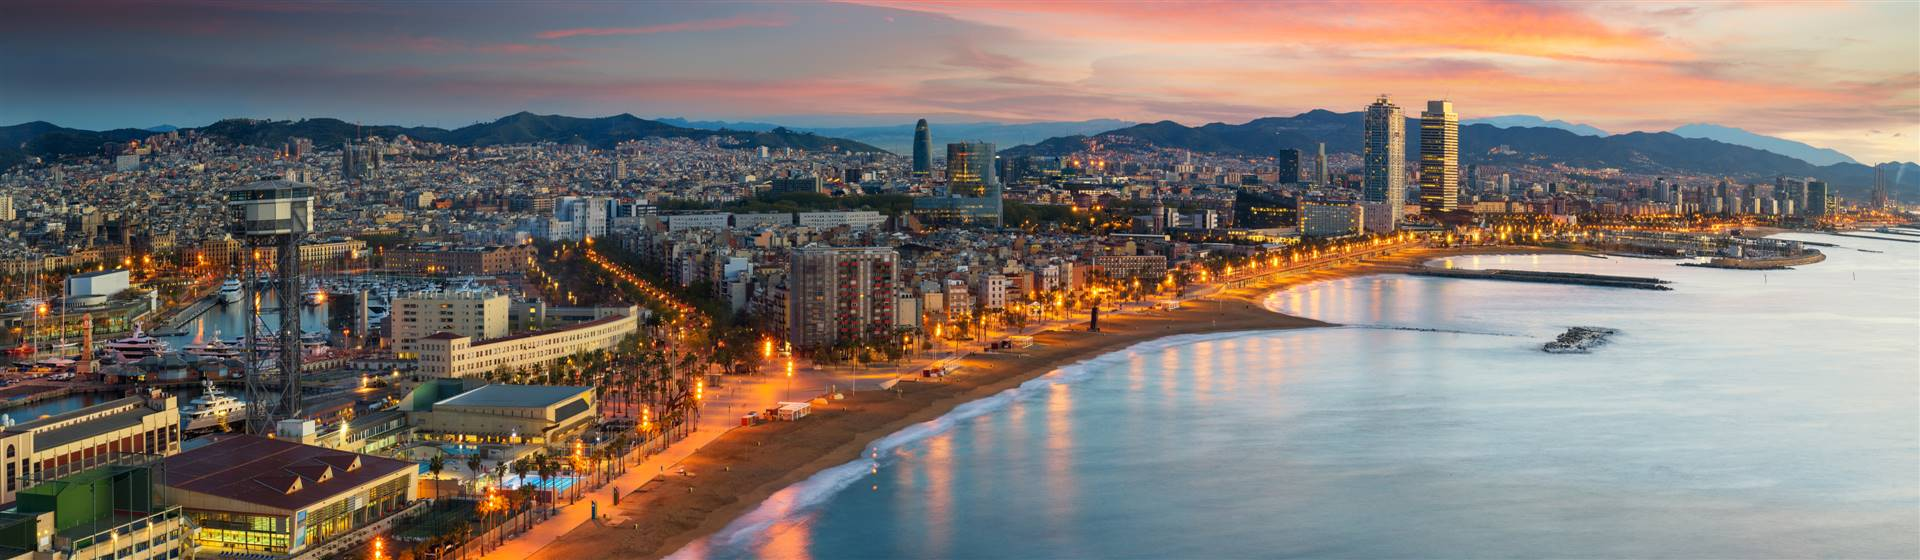 "<img src=""barcelonaspain-shutterstock.jpeg"" alt=""Barcelona - Spain""/>"